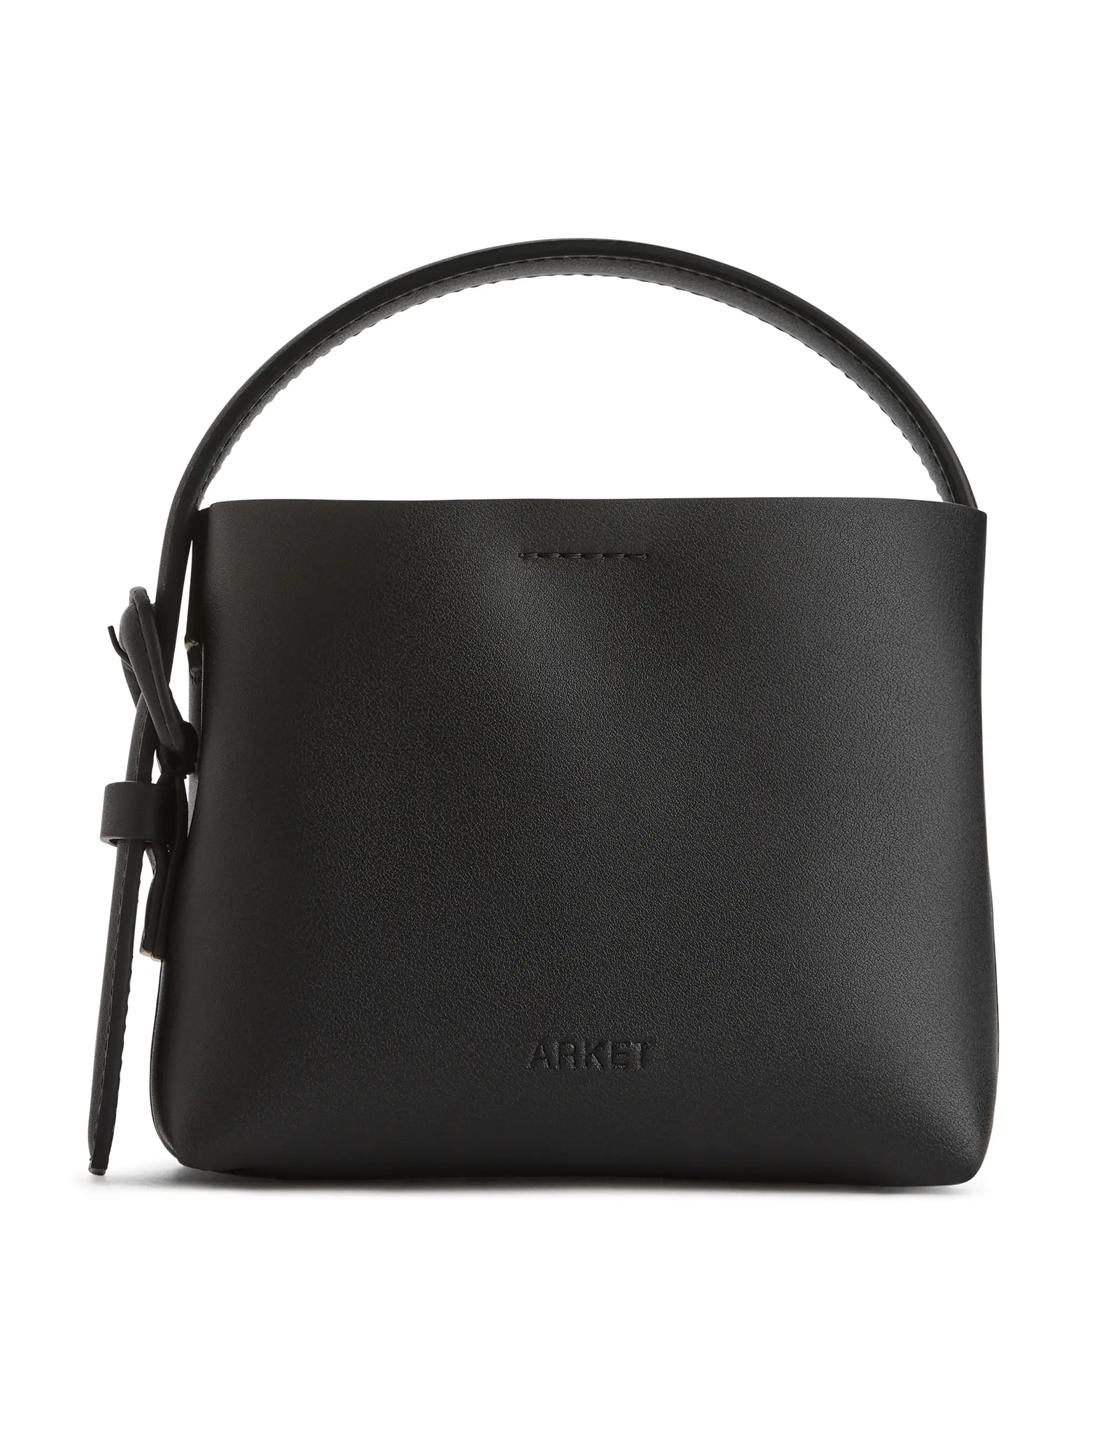 arket small crossbody leather bag